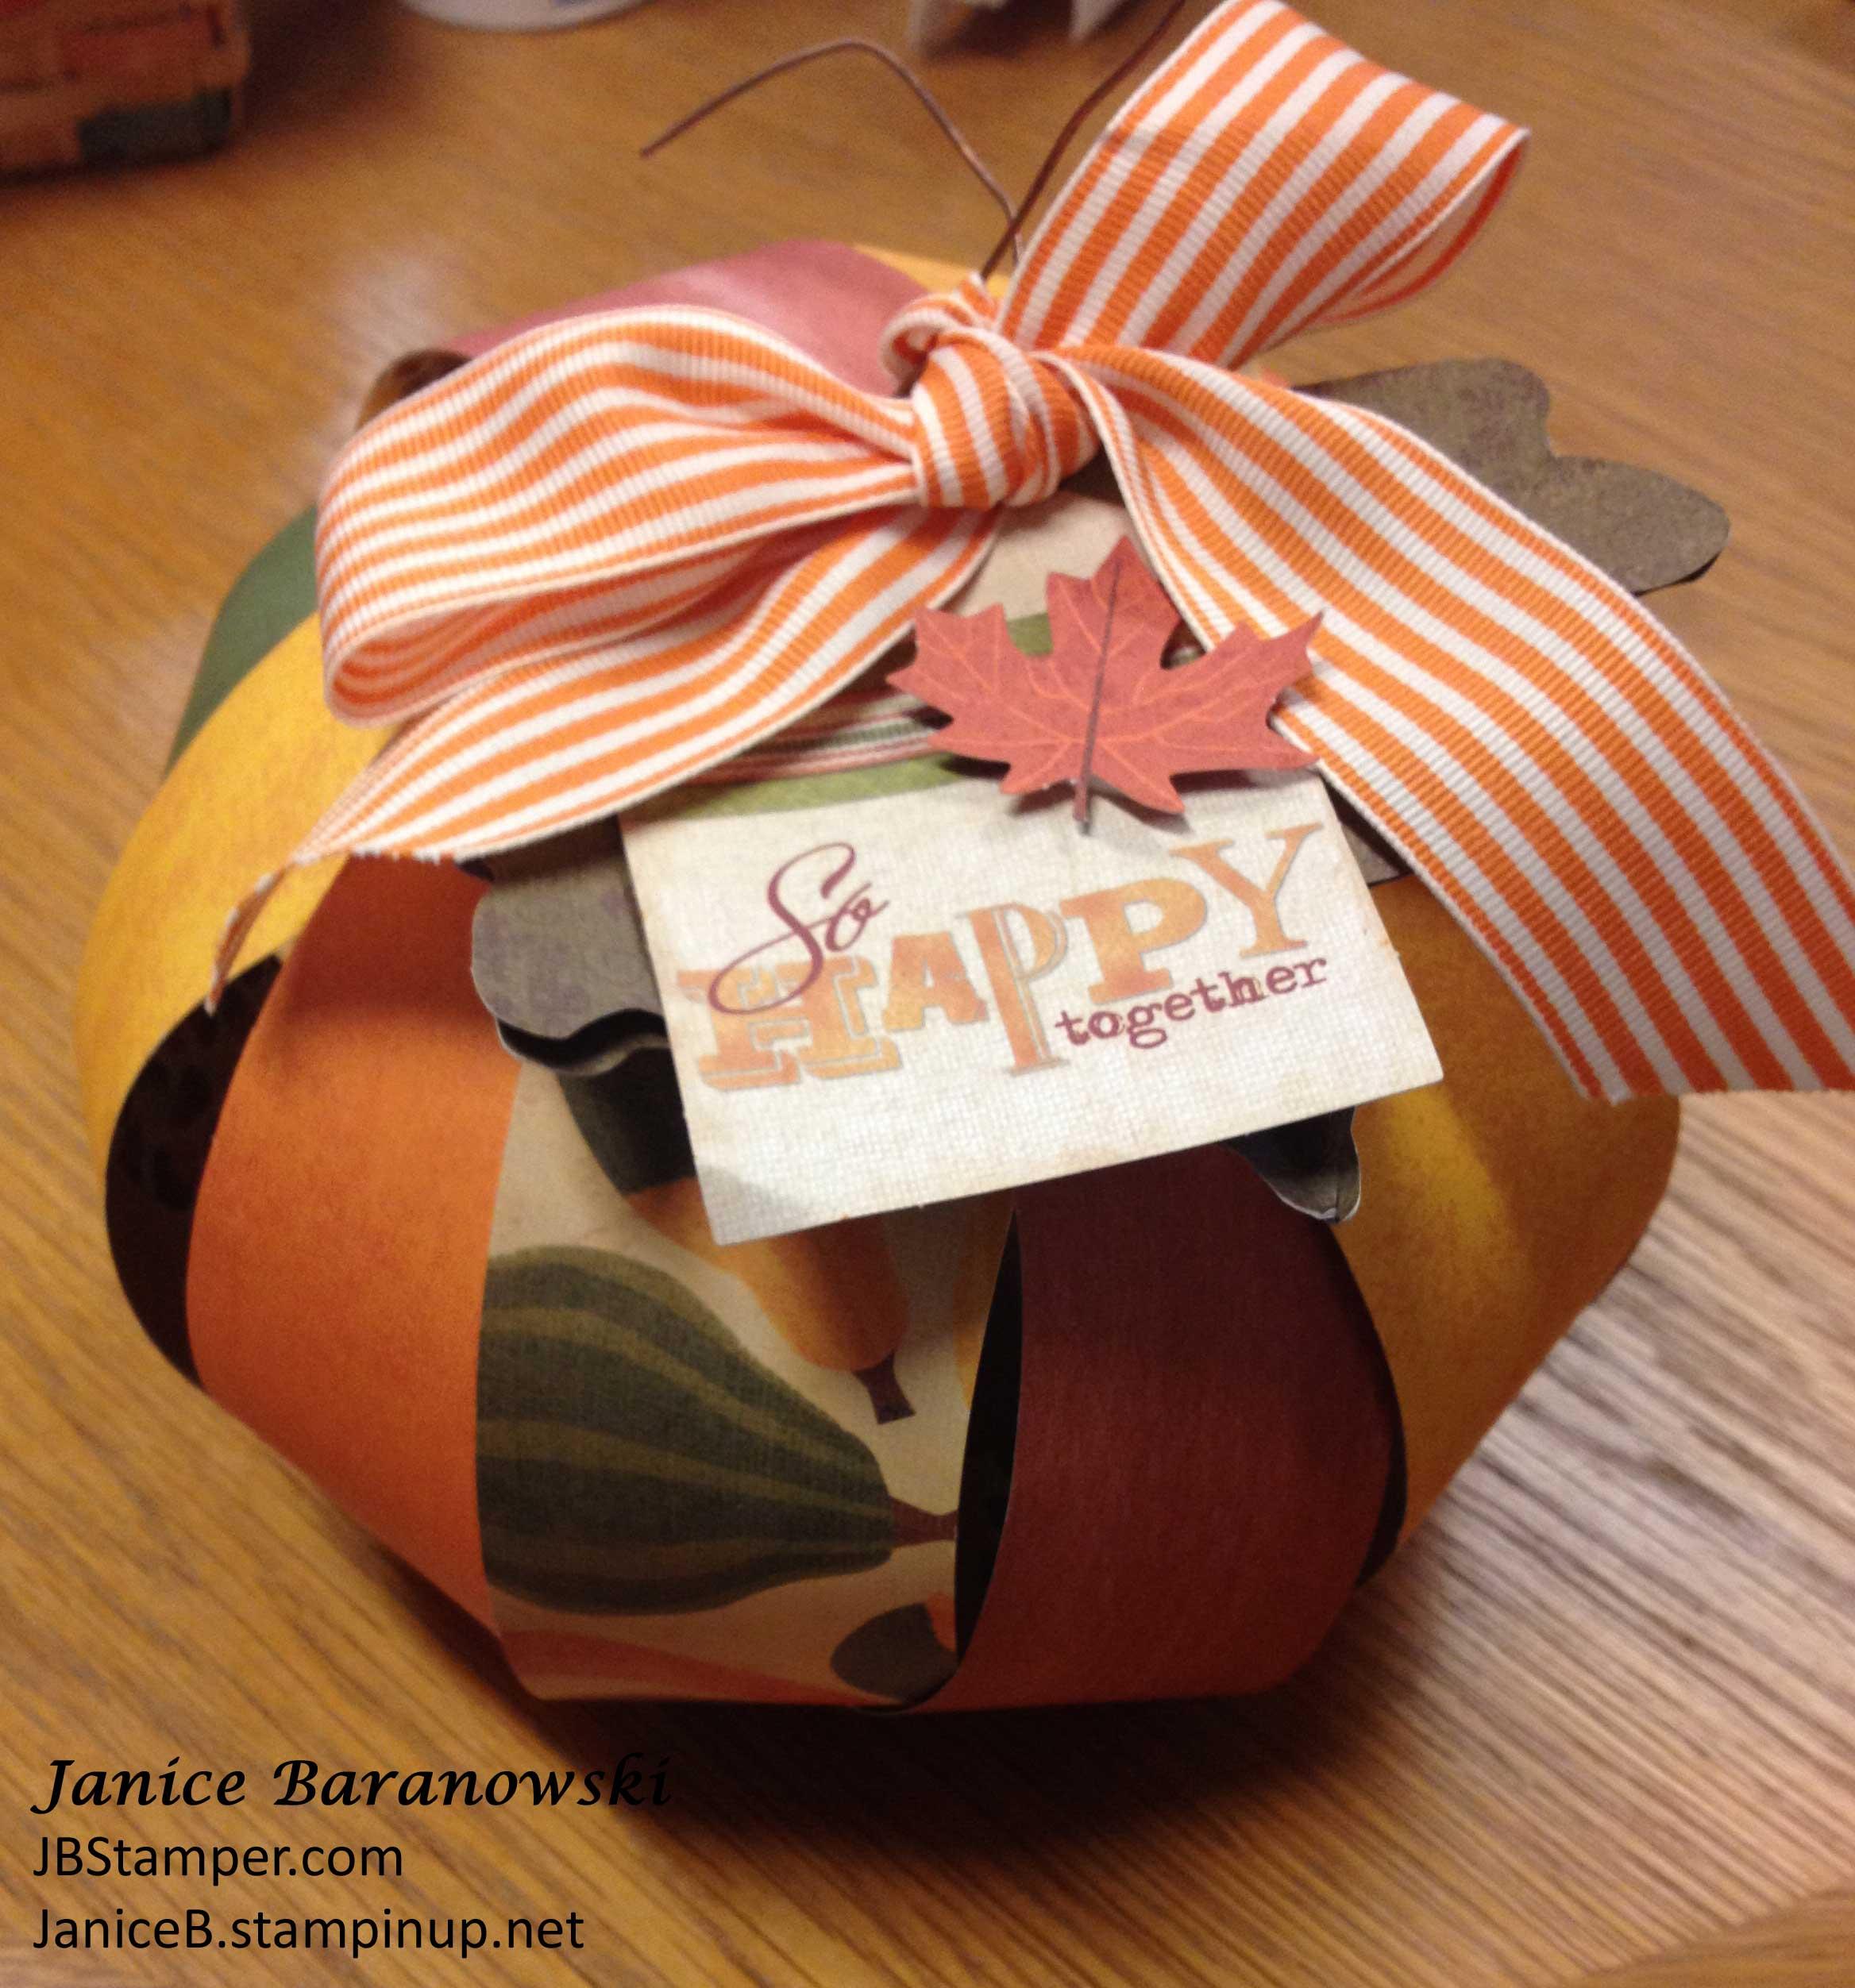 PaperPumpkin-finished